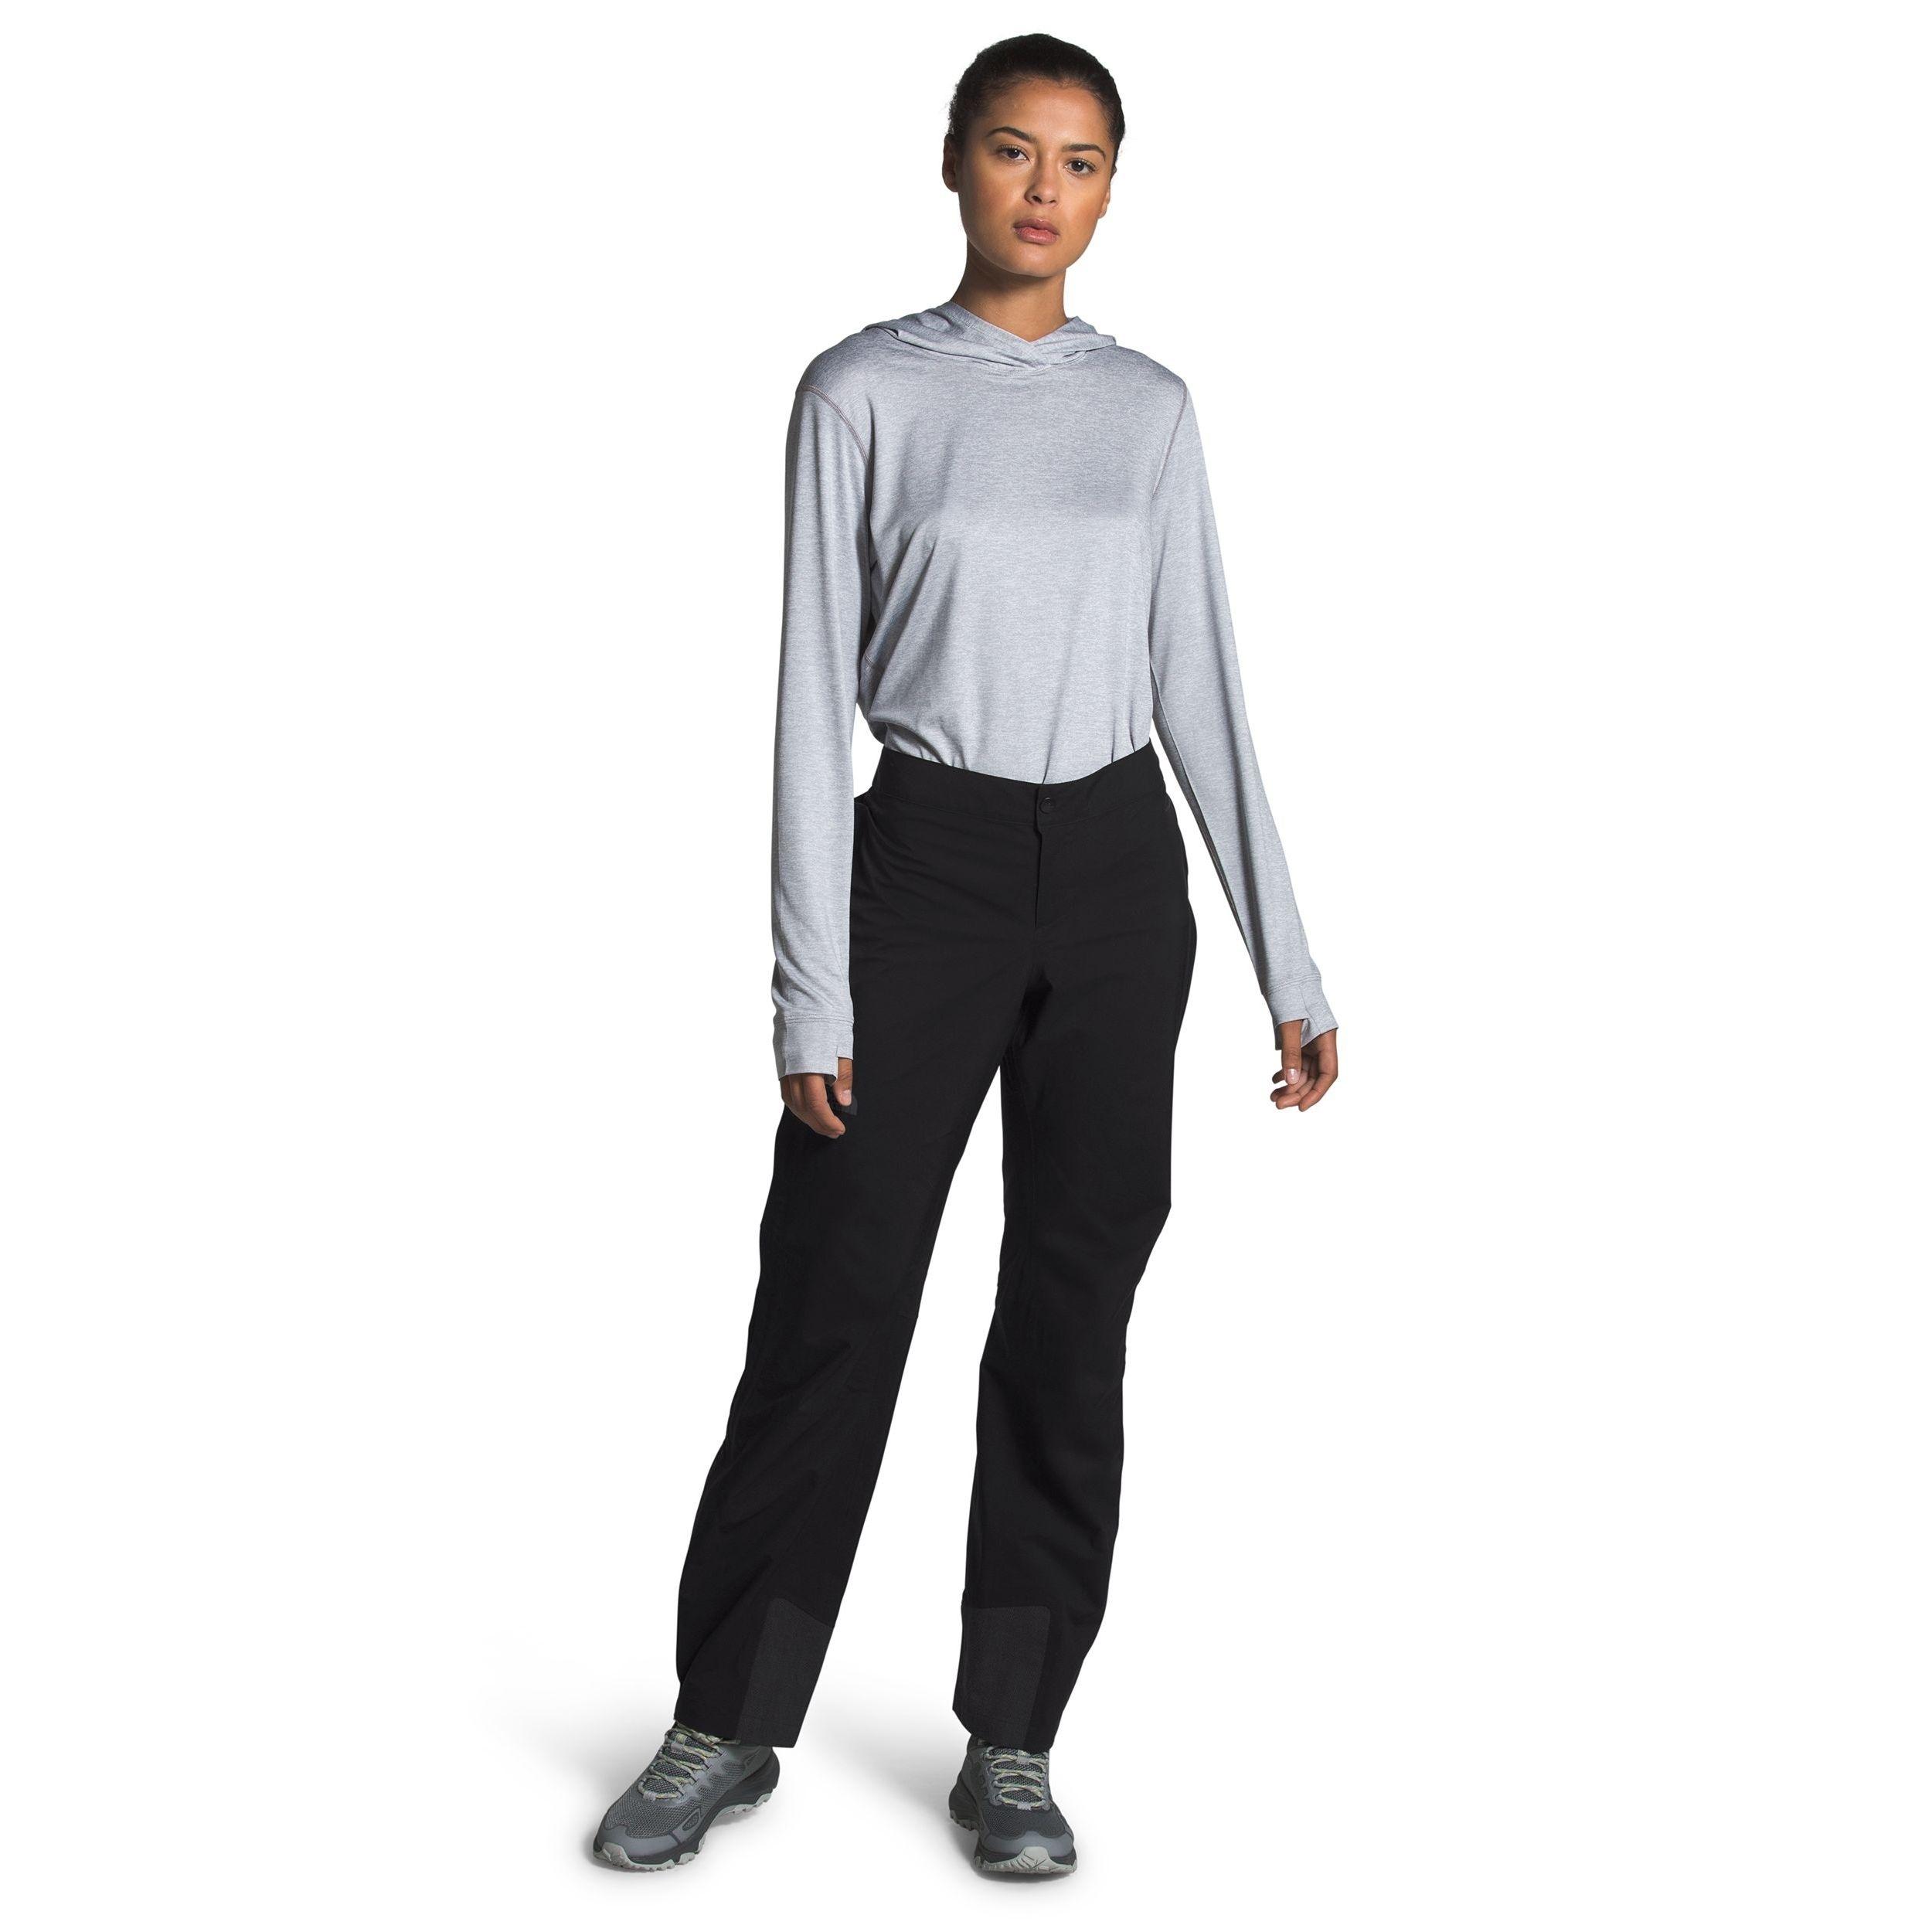 Dryzzle FutureLight Full Zip Pant - Women's